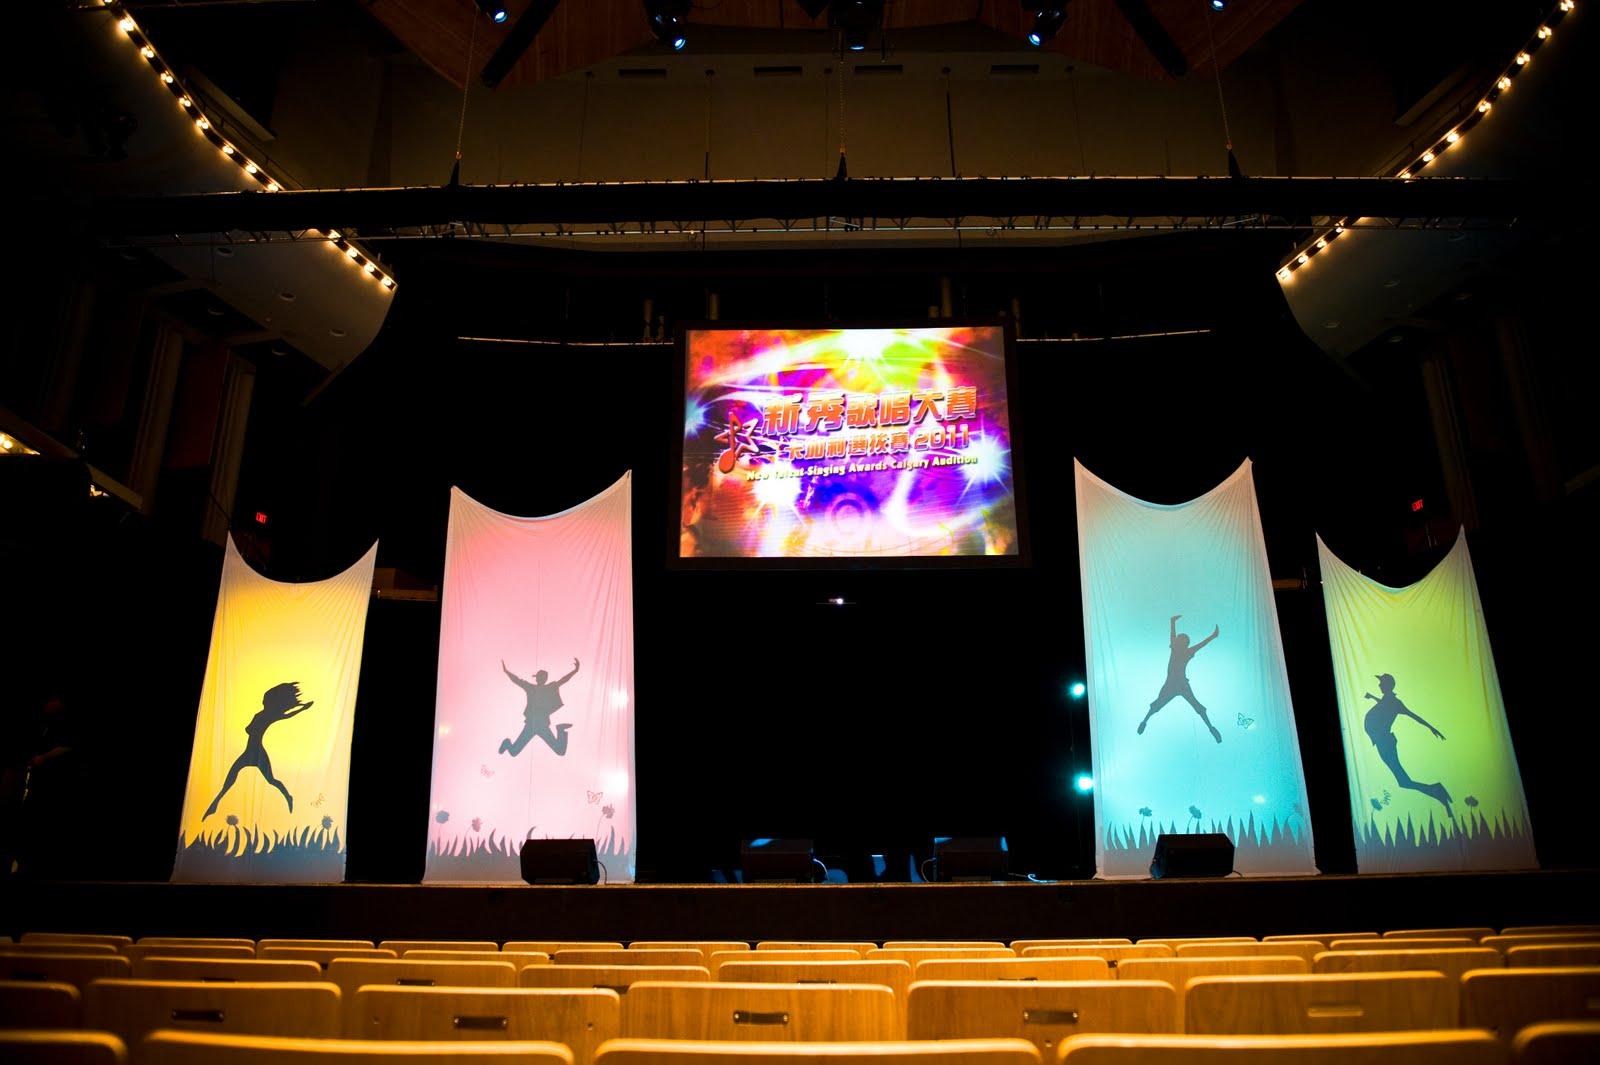 Wishahmon Blog: Stage Design at Jack Singer Concert Hall